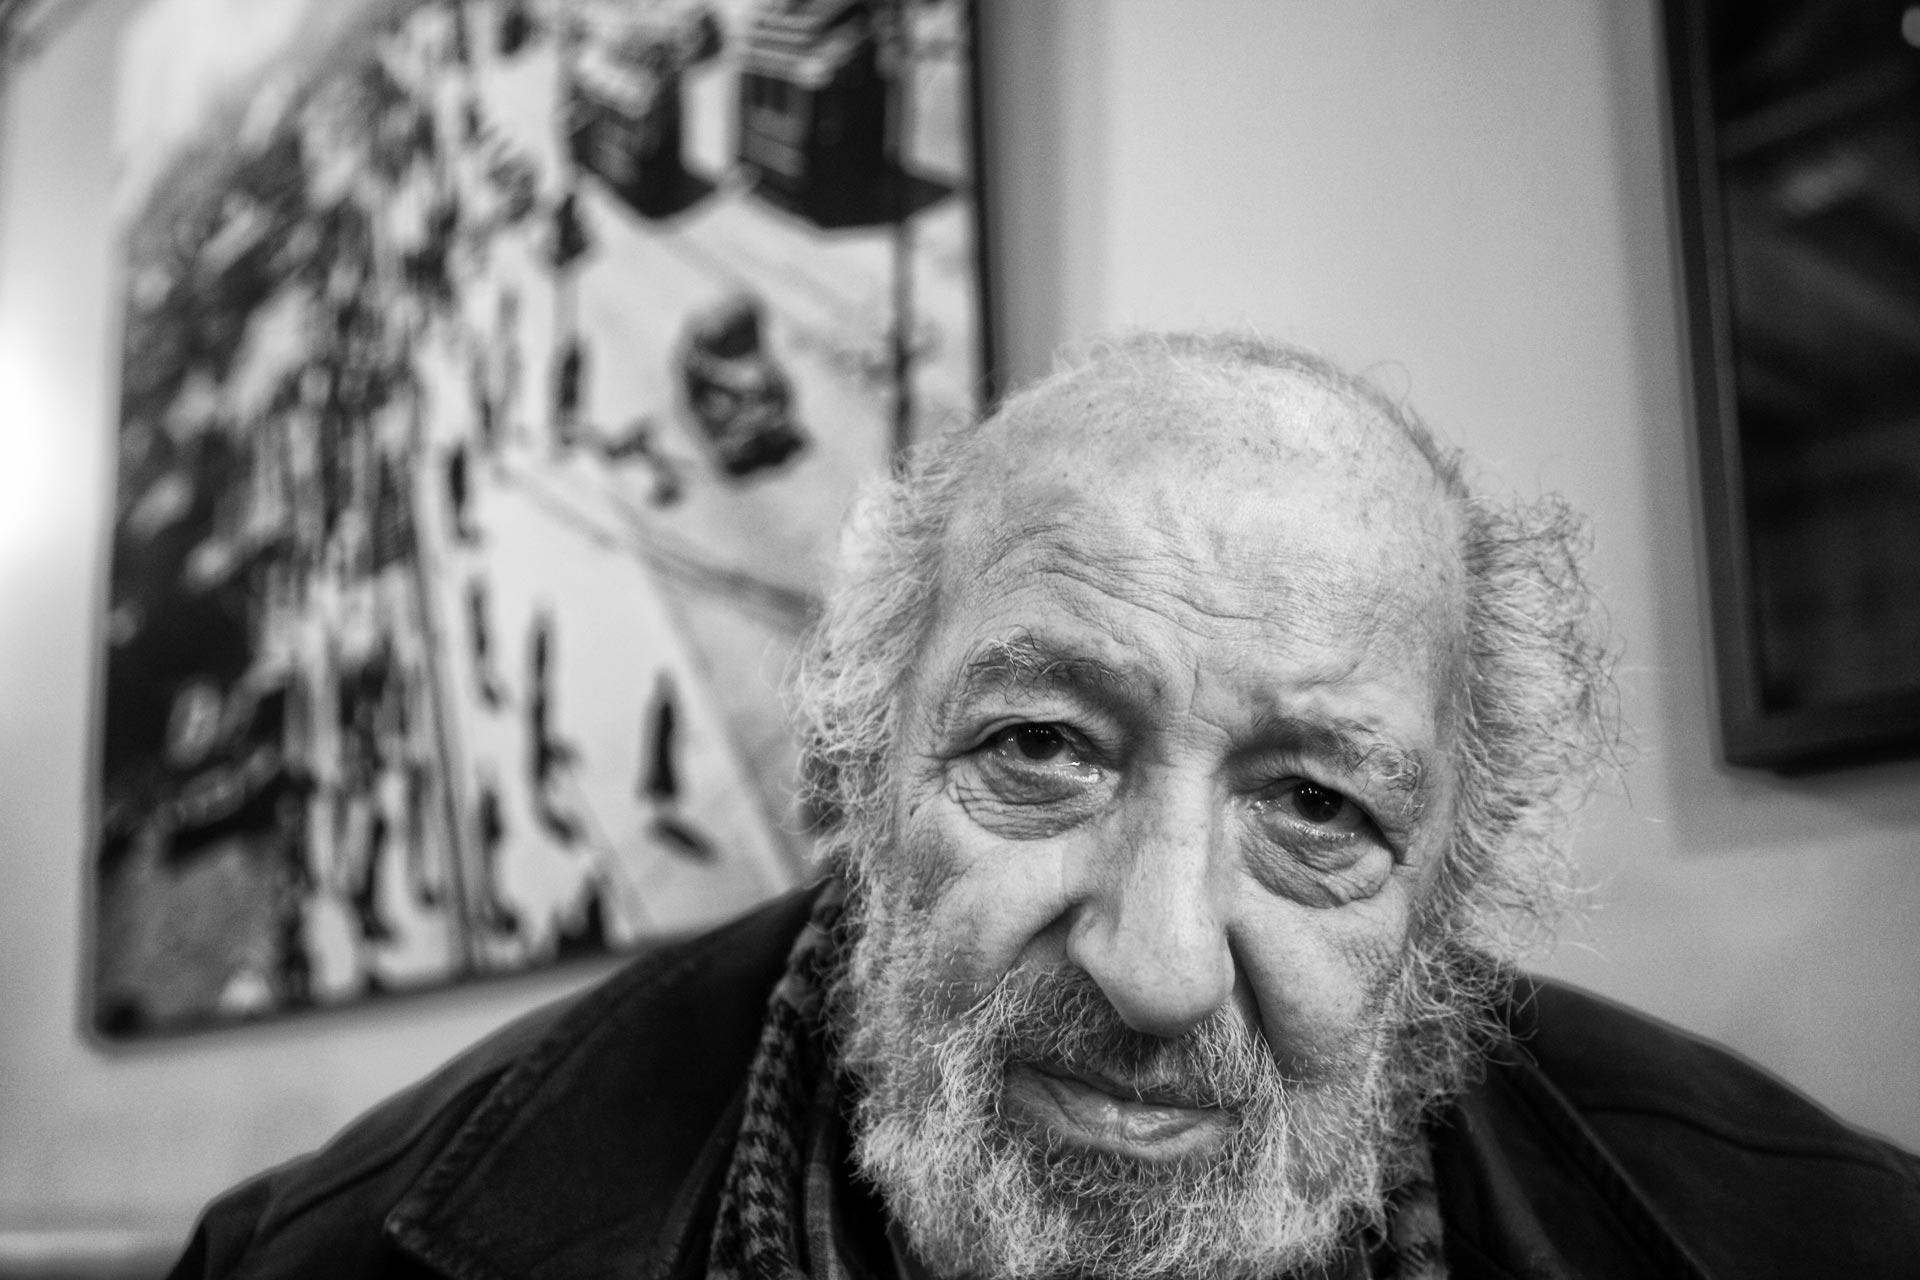 Ara Güler, *1928, Kafe Ara, Beyoğlu/İstanbul, is an Armenian-Turkish photojournalist. Güler, former member of the Magnum agency, is considered one of Turkey's few internationally known photographers -